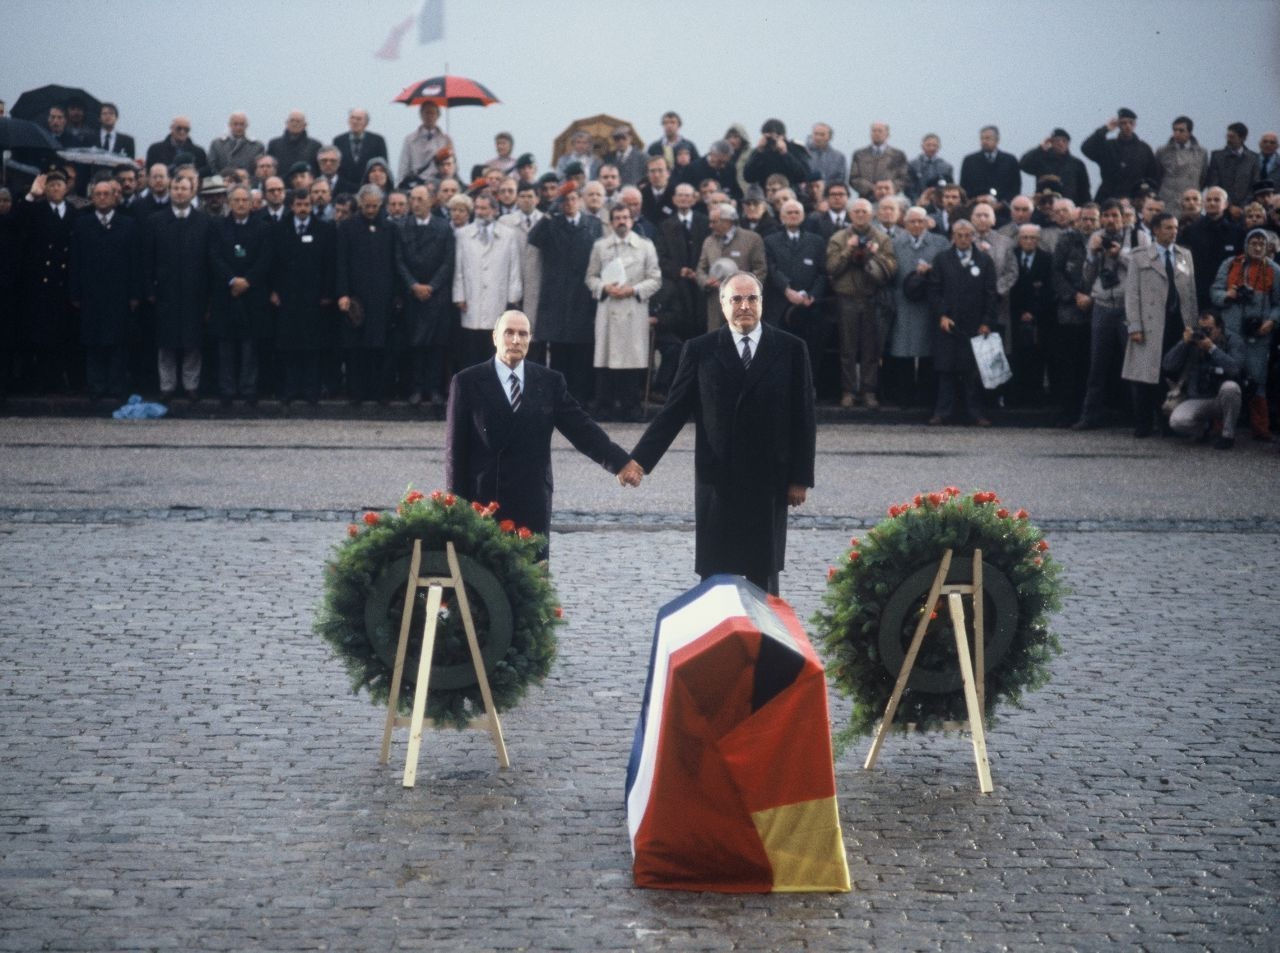 Foto Francois Mitterrand und Helmut Kohl in Verdun